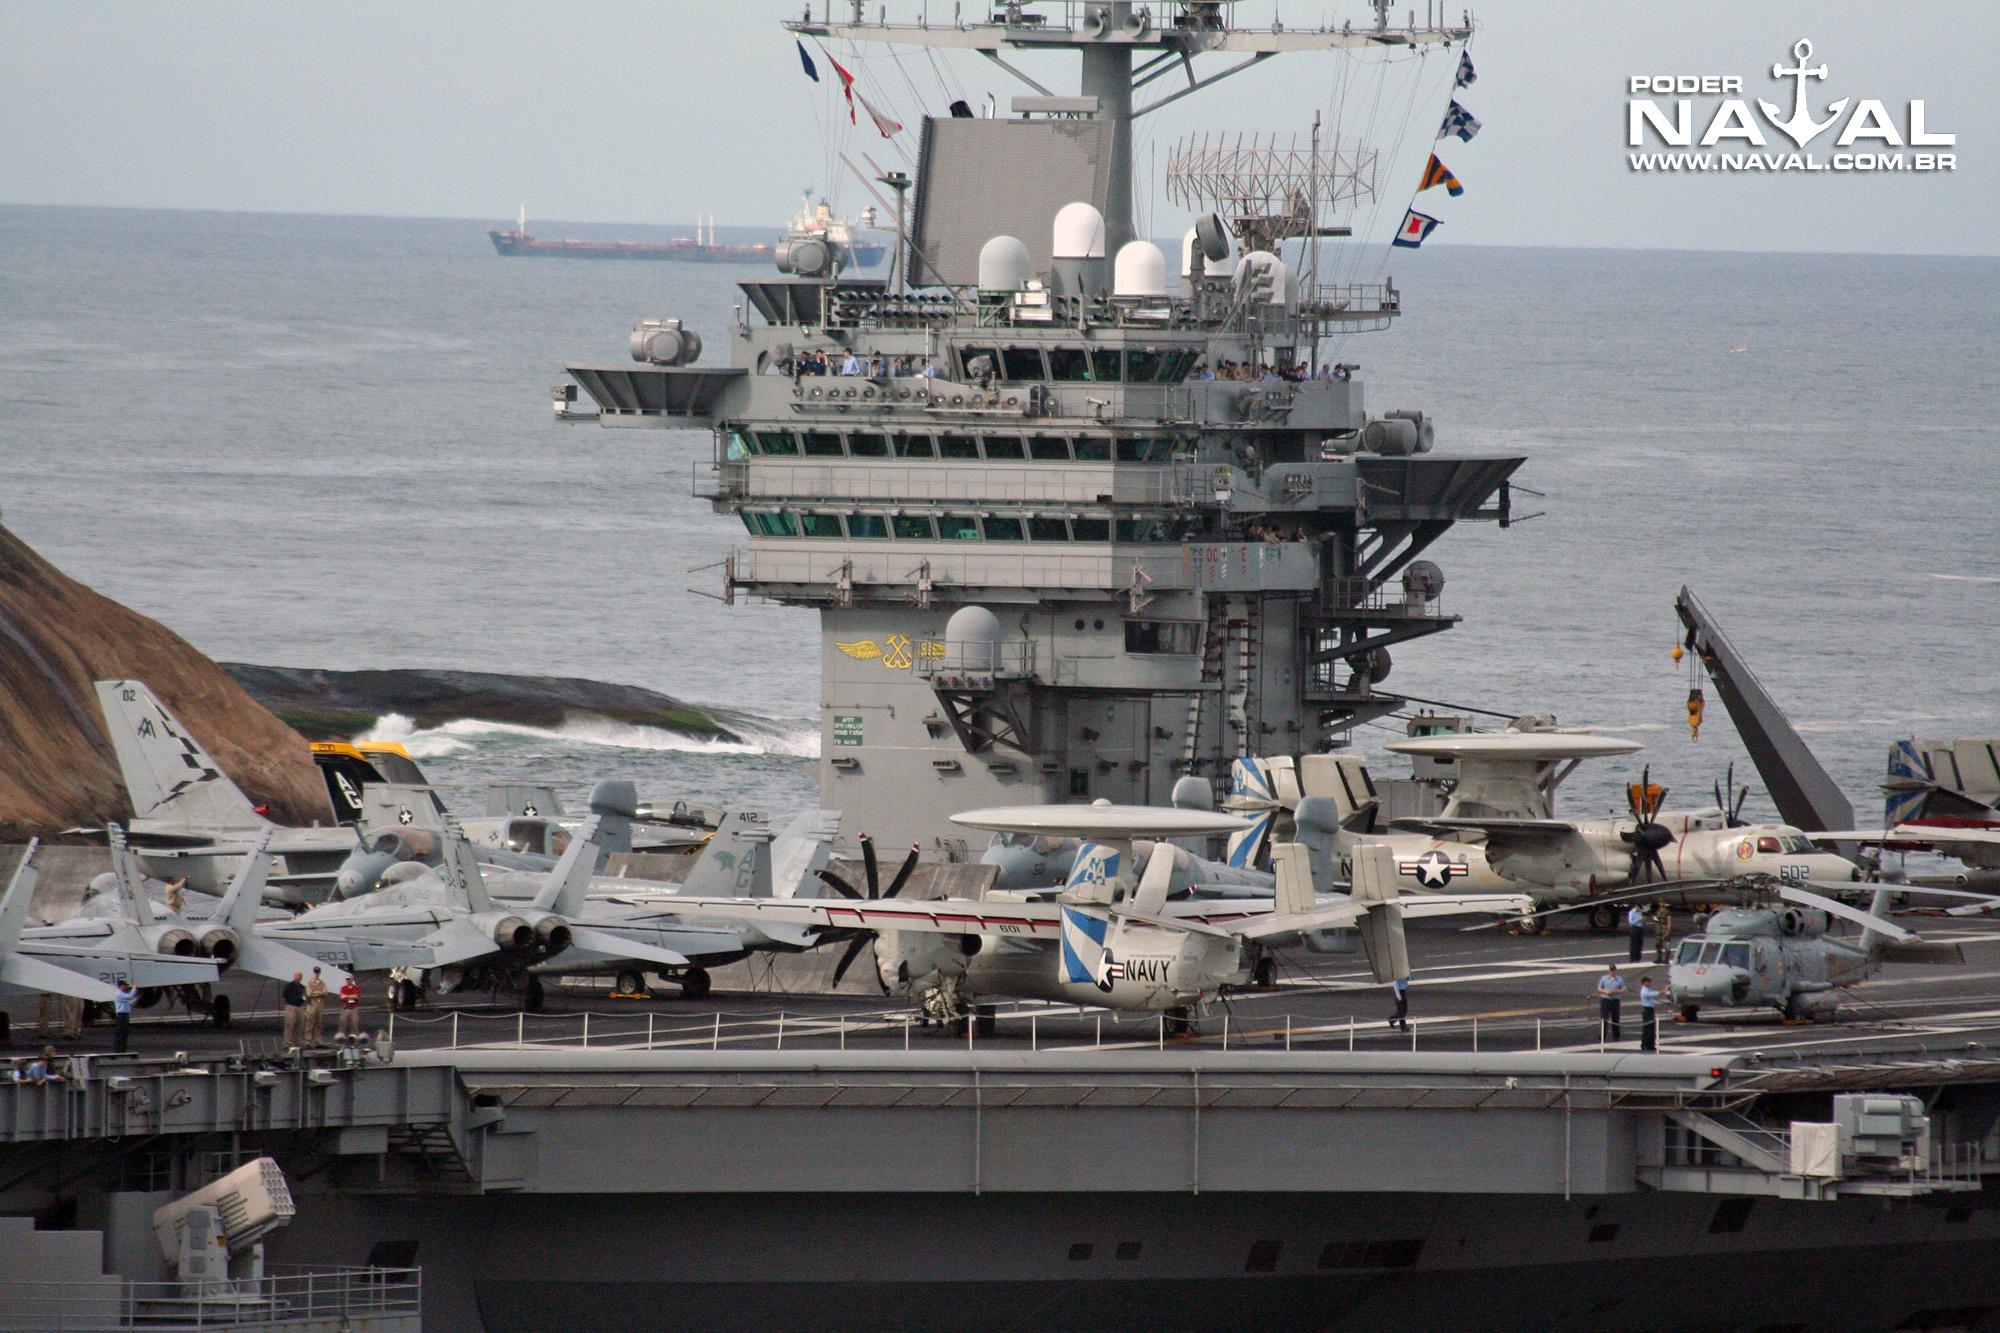 USS George Washington (CVN-73) no Rio - 2008 - 7